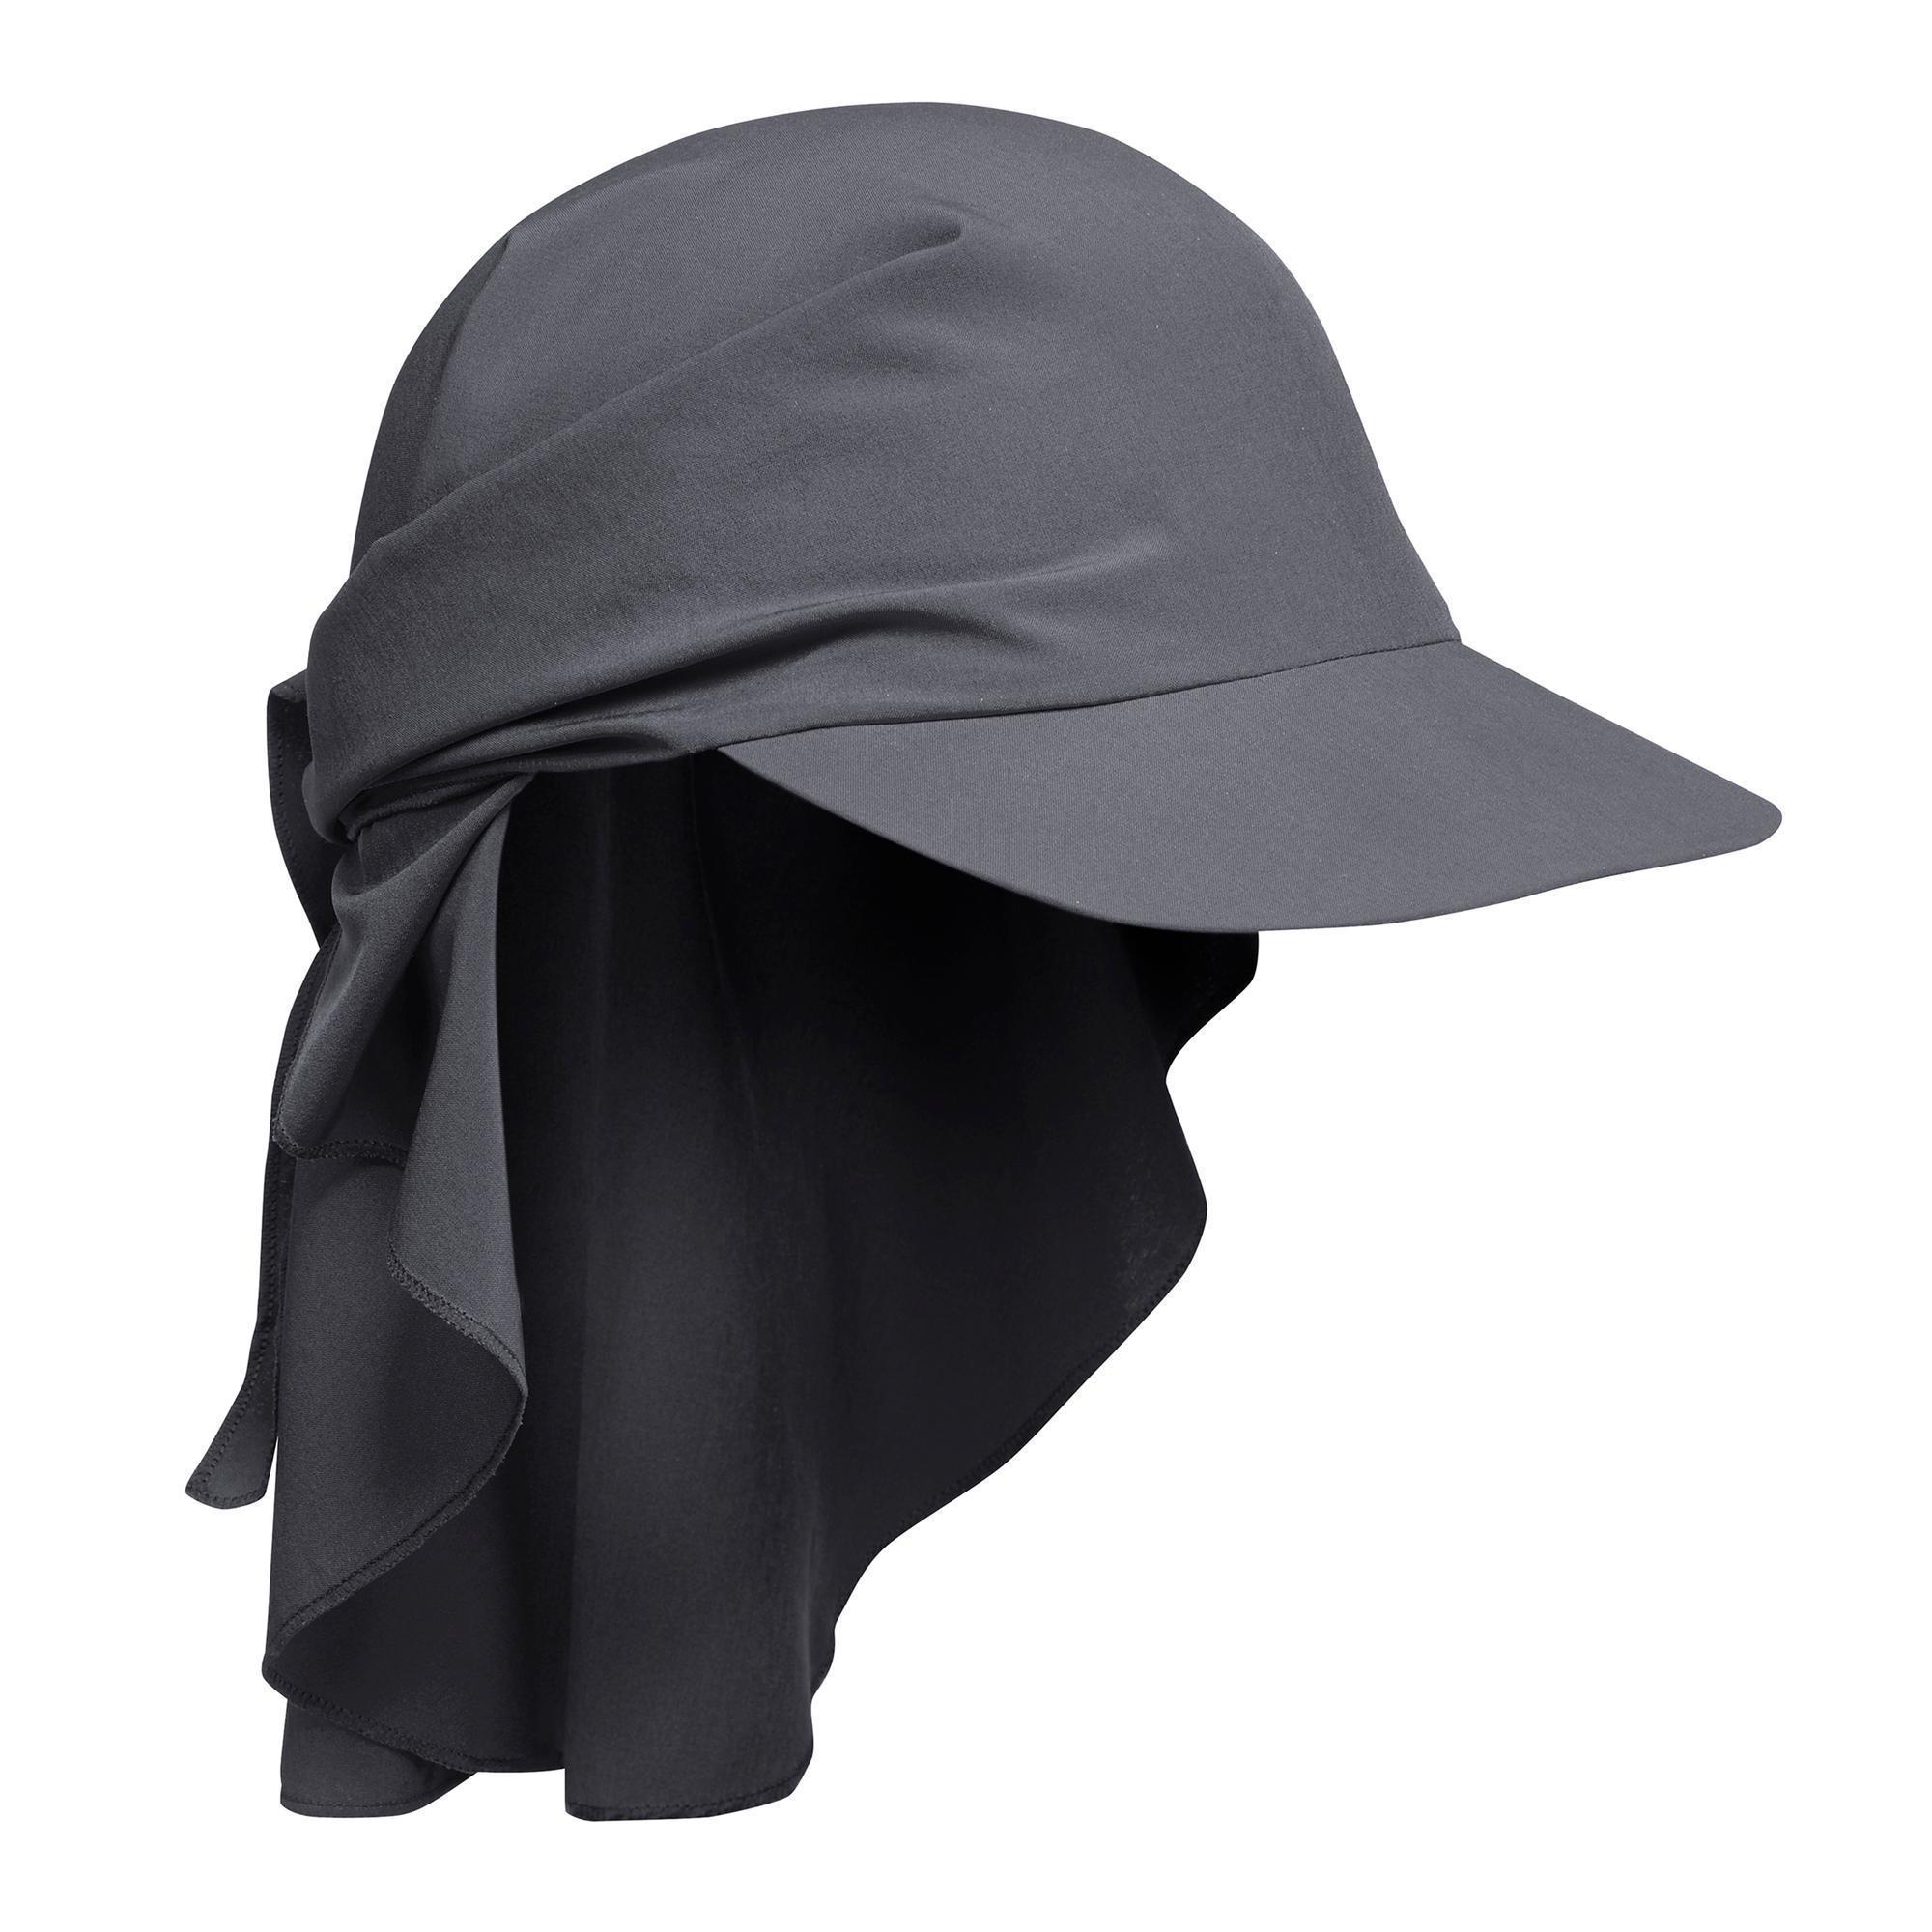 [Decathlon Abholung] Forclaz Cap Trek 100 UL Schirmmütze